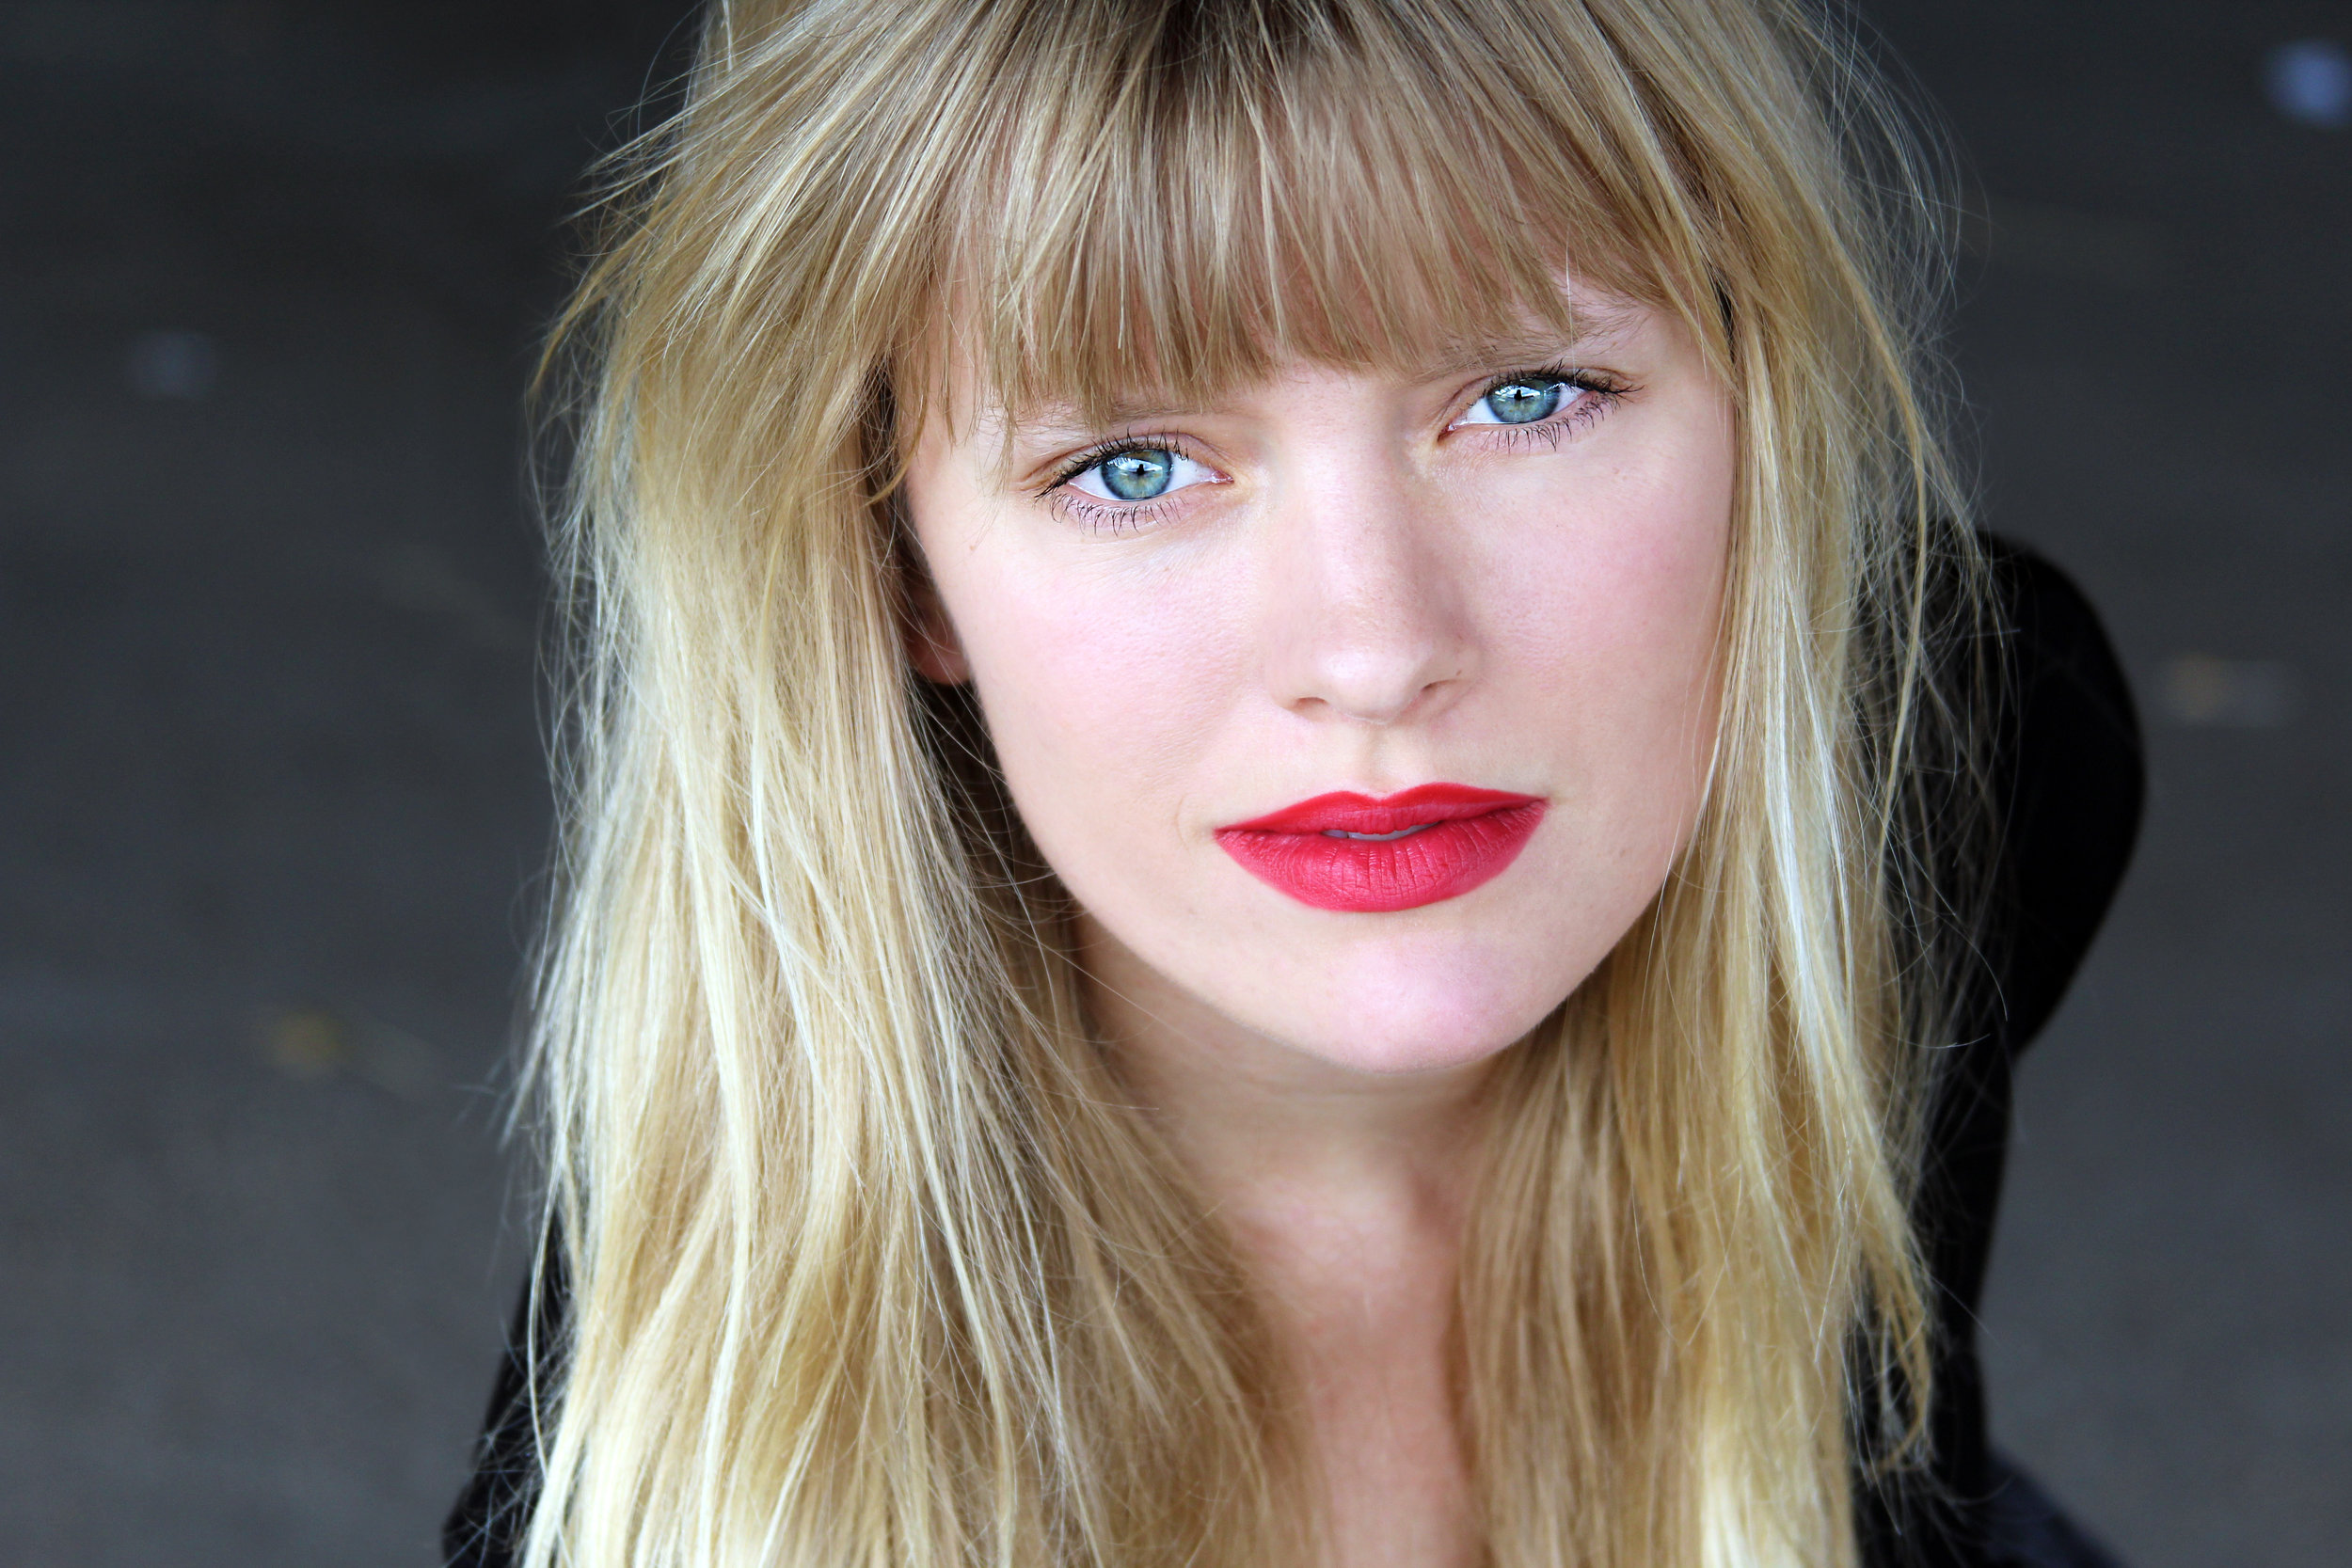 Sarah Durn Headshot - Red Lip Look 1.jpg